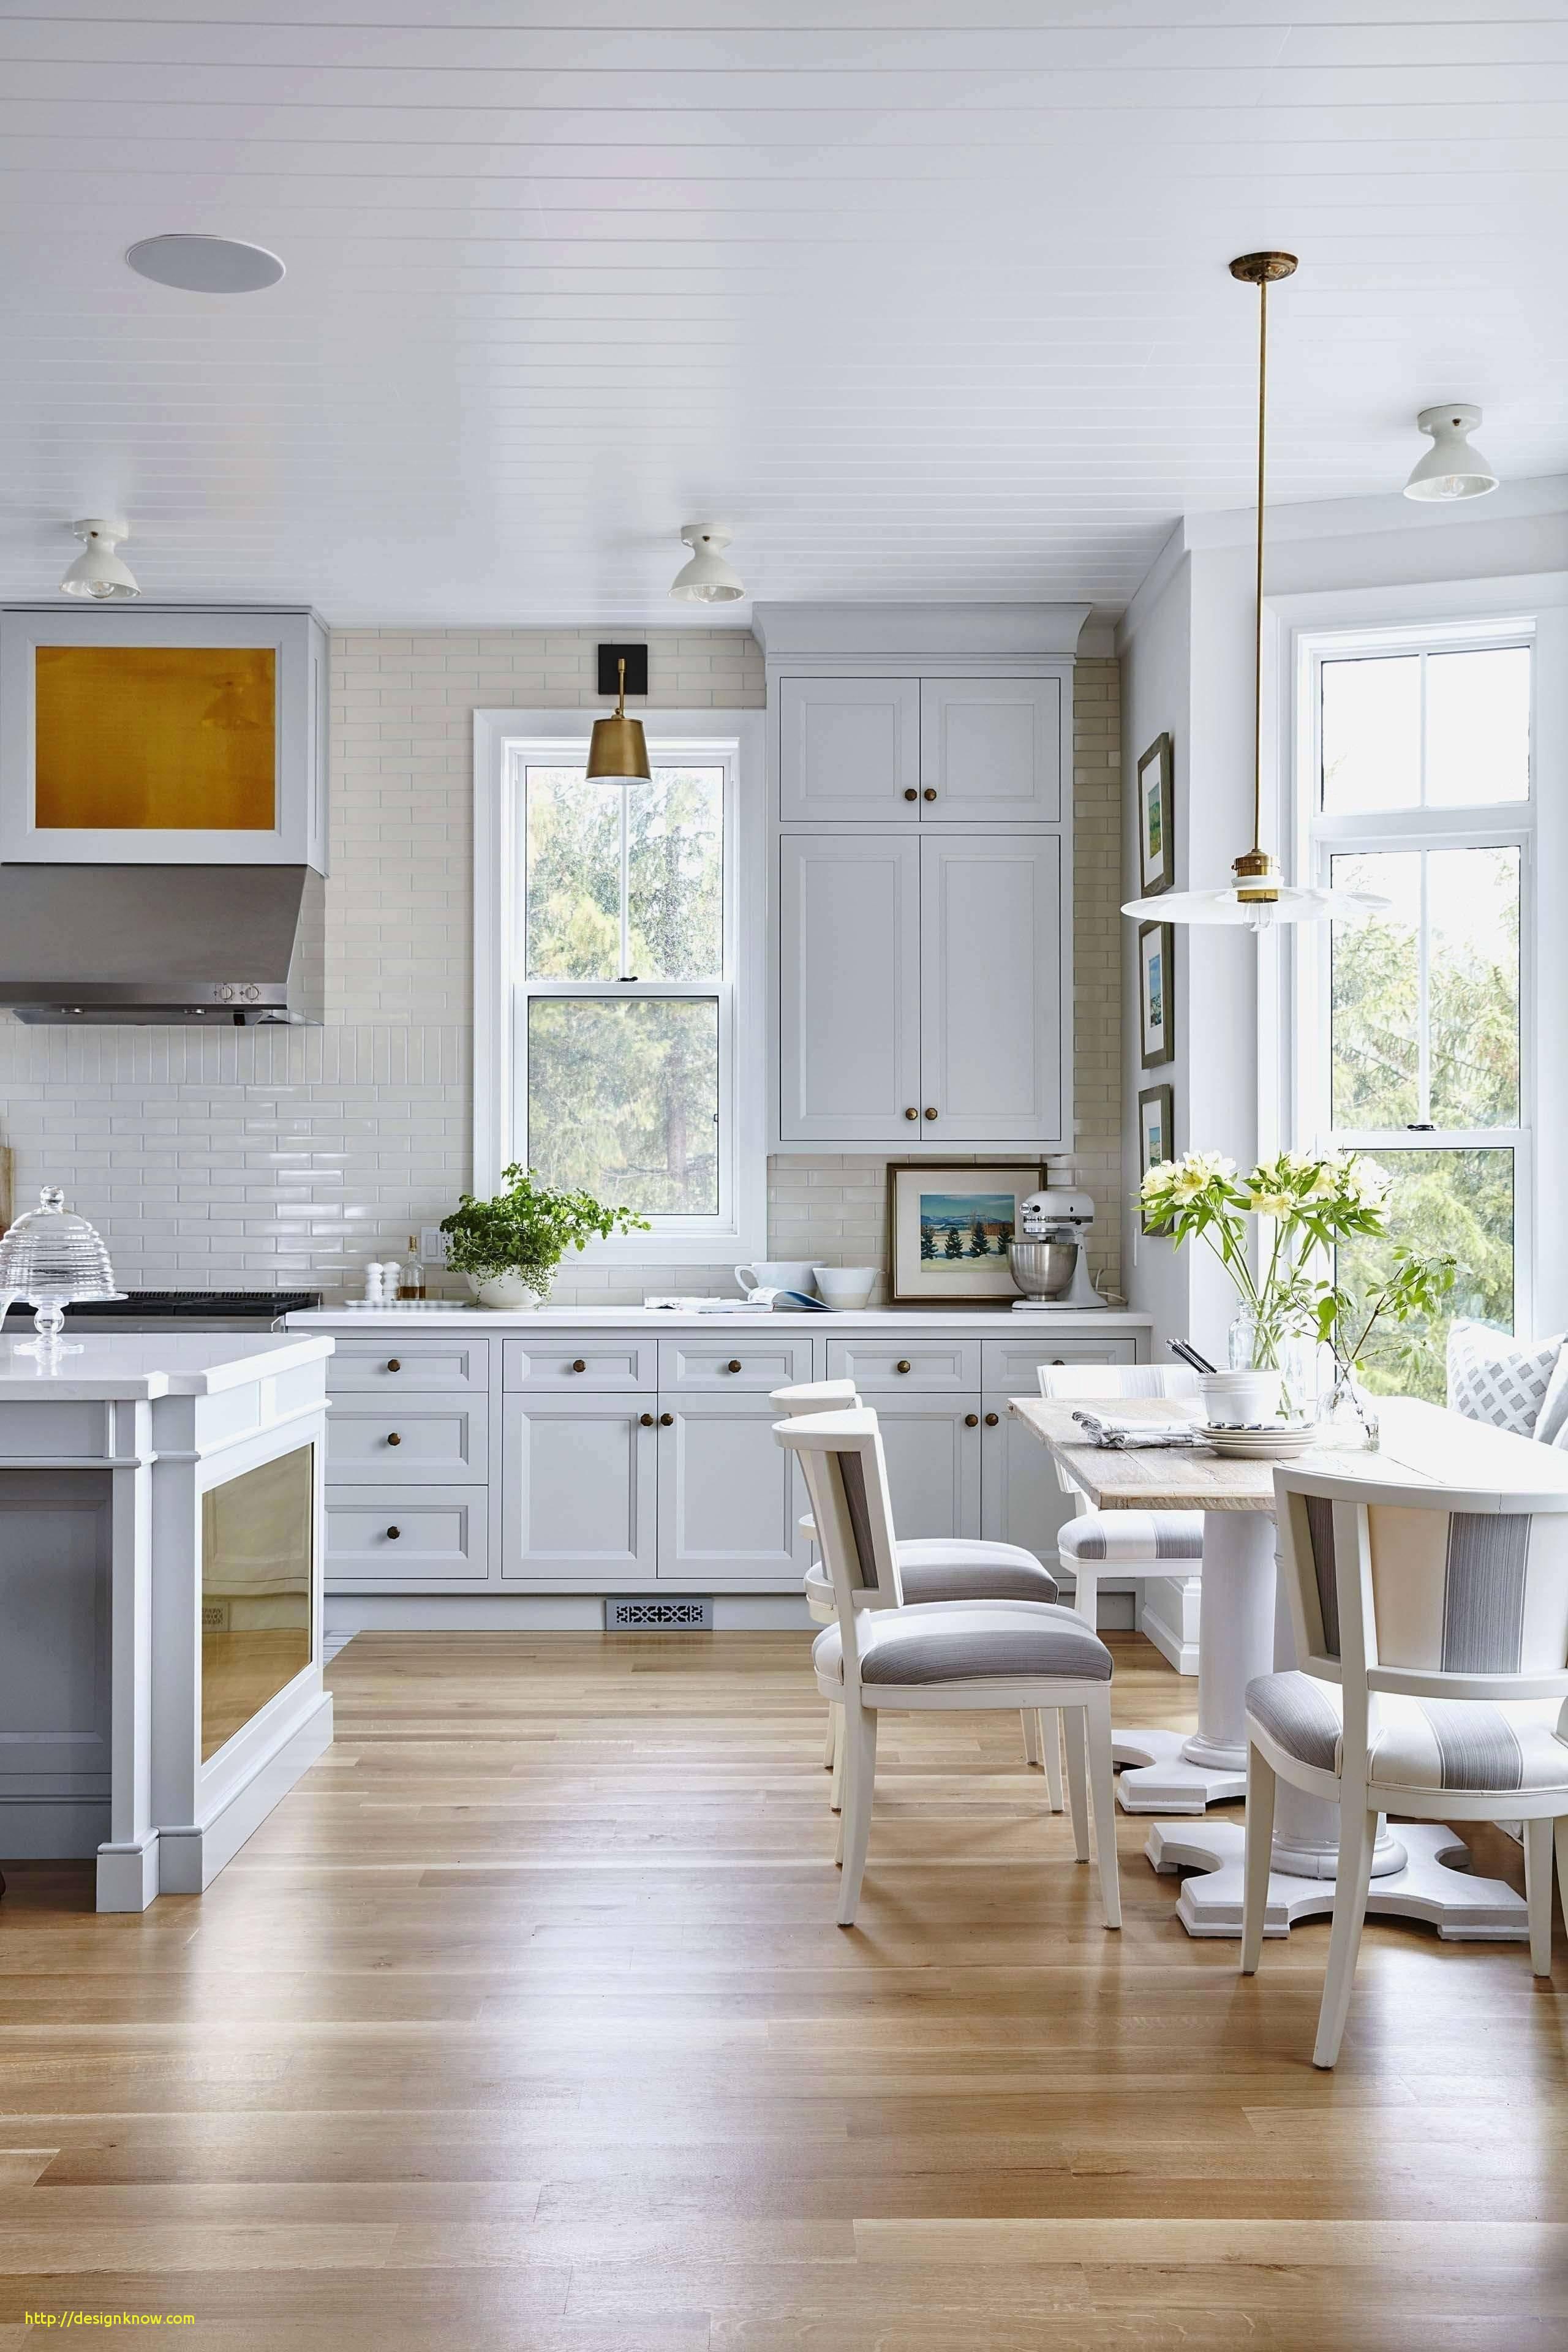 luxury interior design for small apartments elegant small apartment awesome tiny apartment design luxury kitchen joys of luxury interior design for small apartments